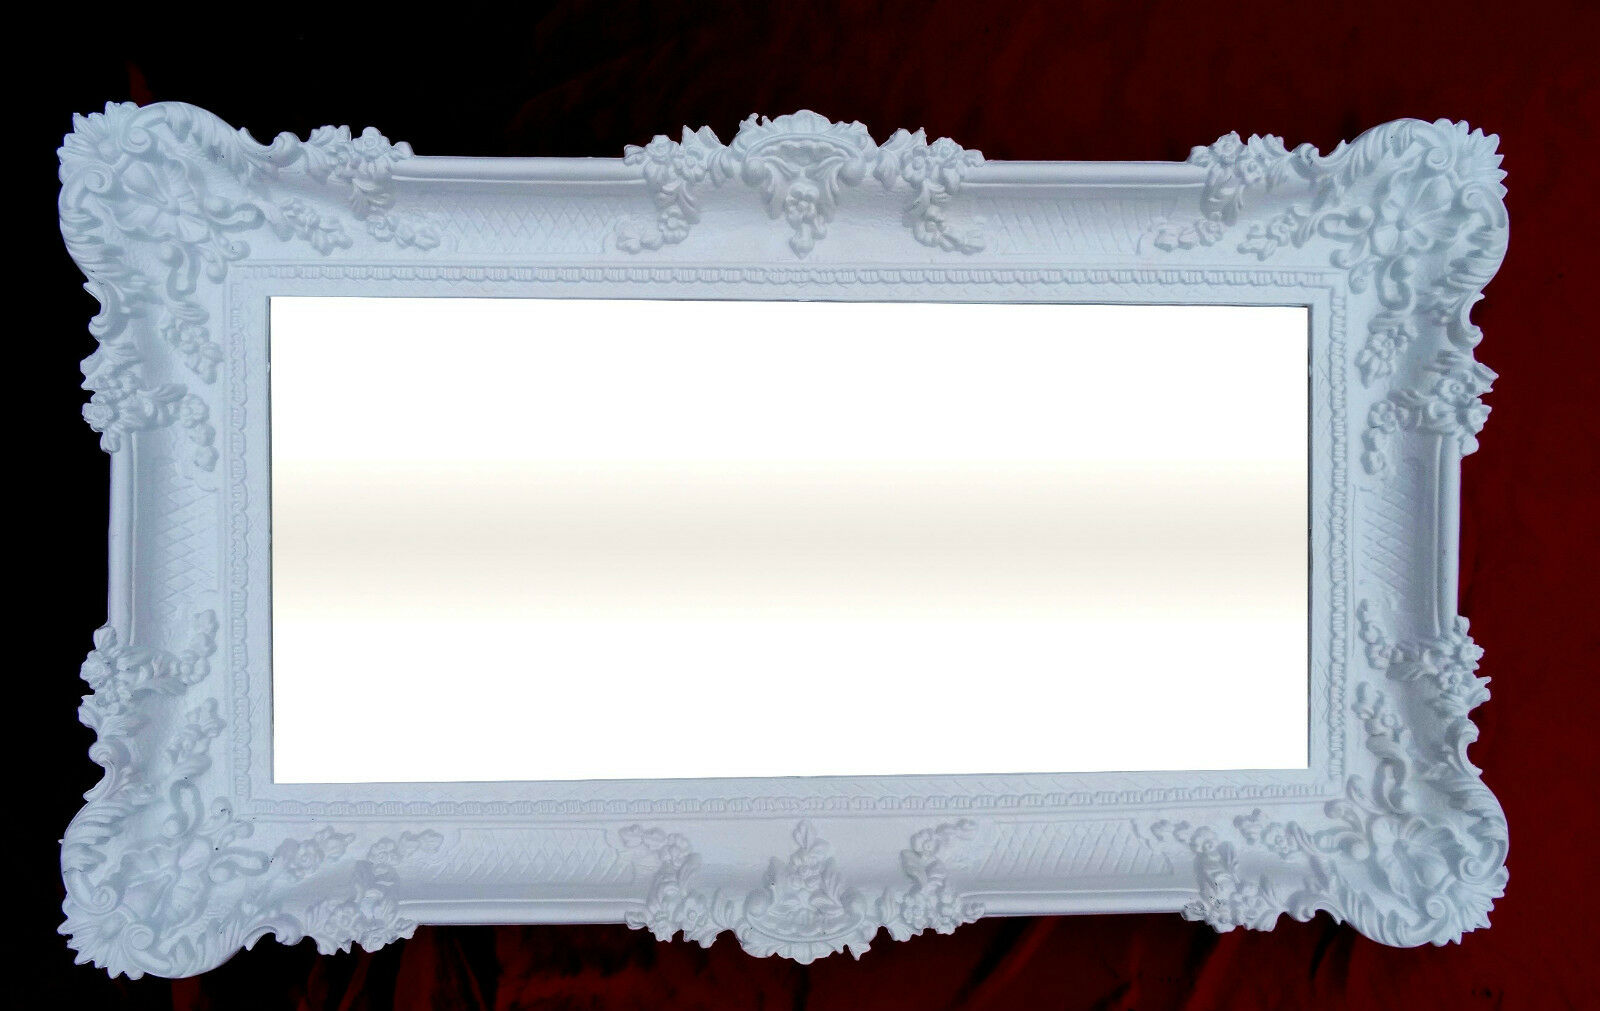 baroque wall mirror black gold mirror wall deco deco 97x57. Black Bedroom Furniture Sets. Home Design Ideas